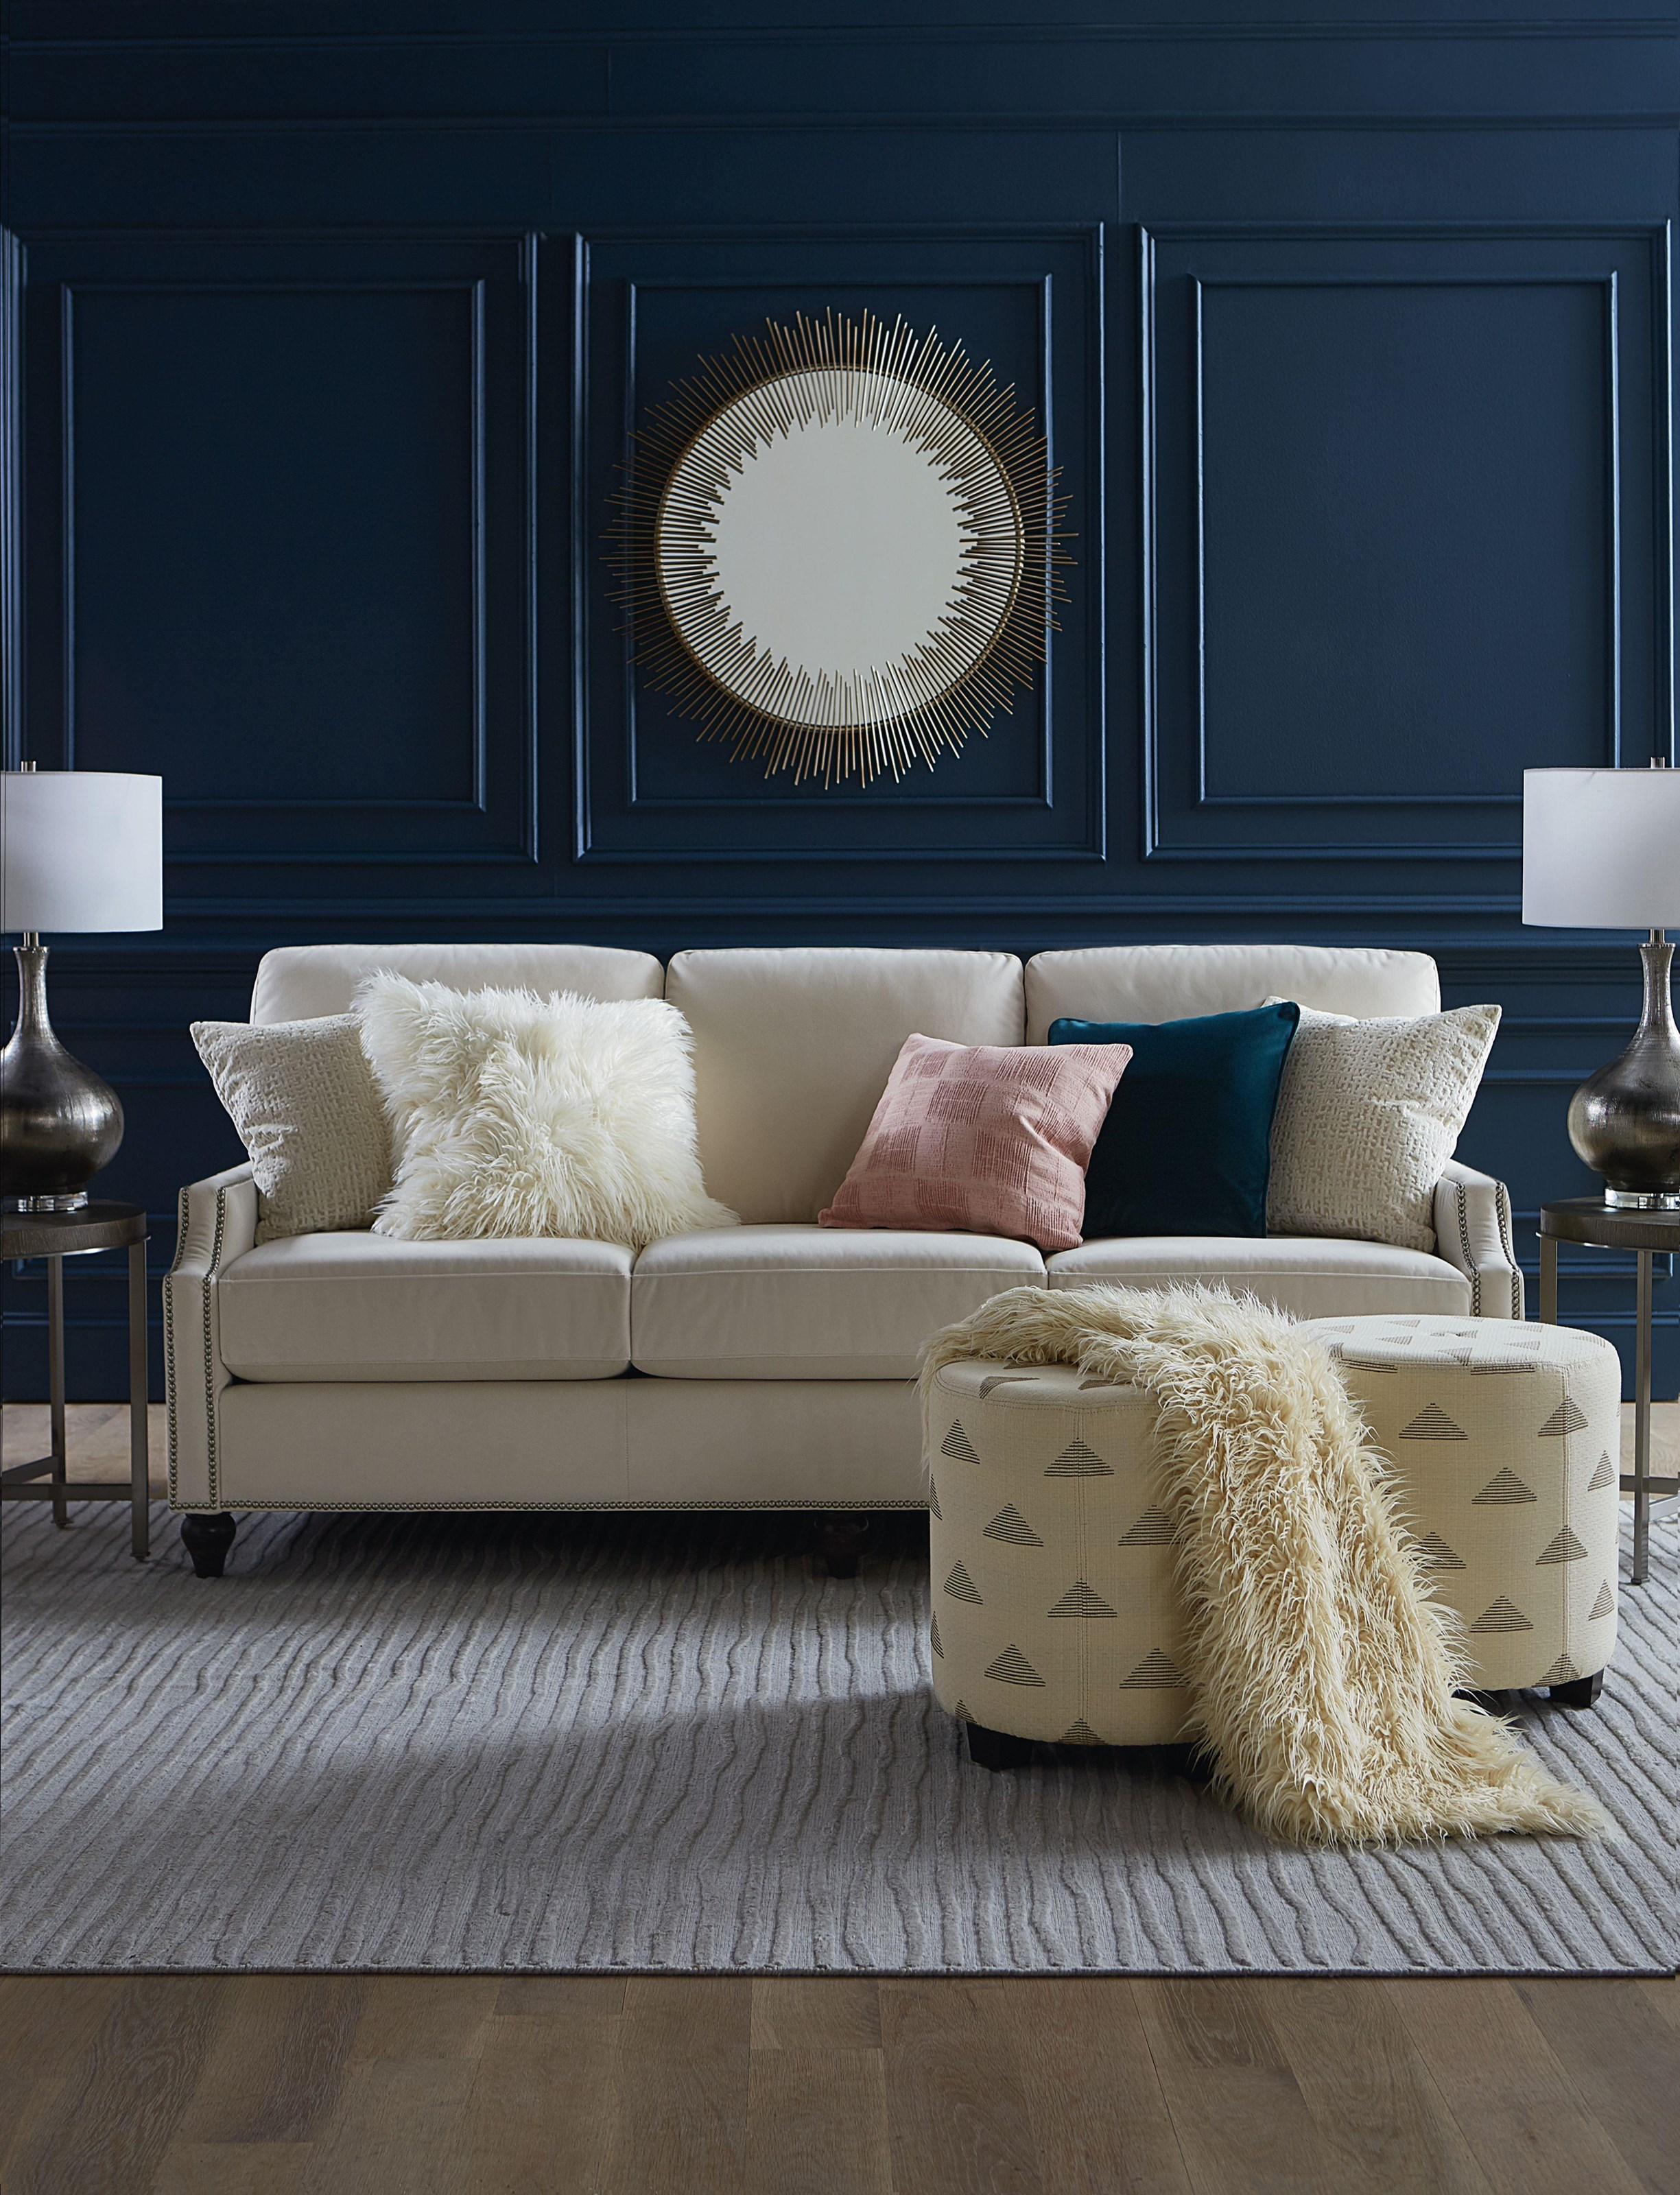 Custom Upholstery Living Room Group Bassett Custom by Bassett at Crowley Furniture & Mattress